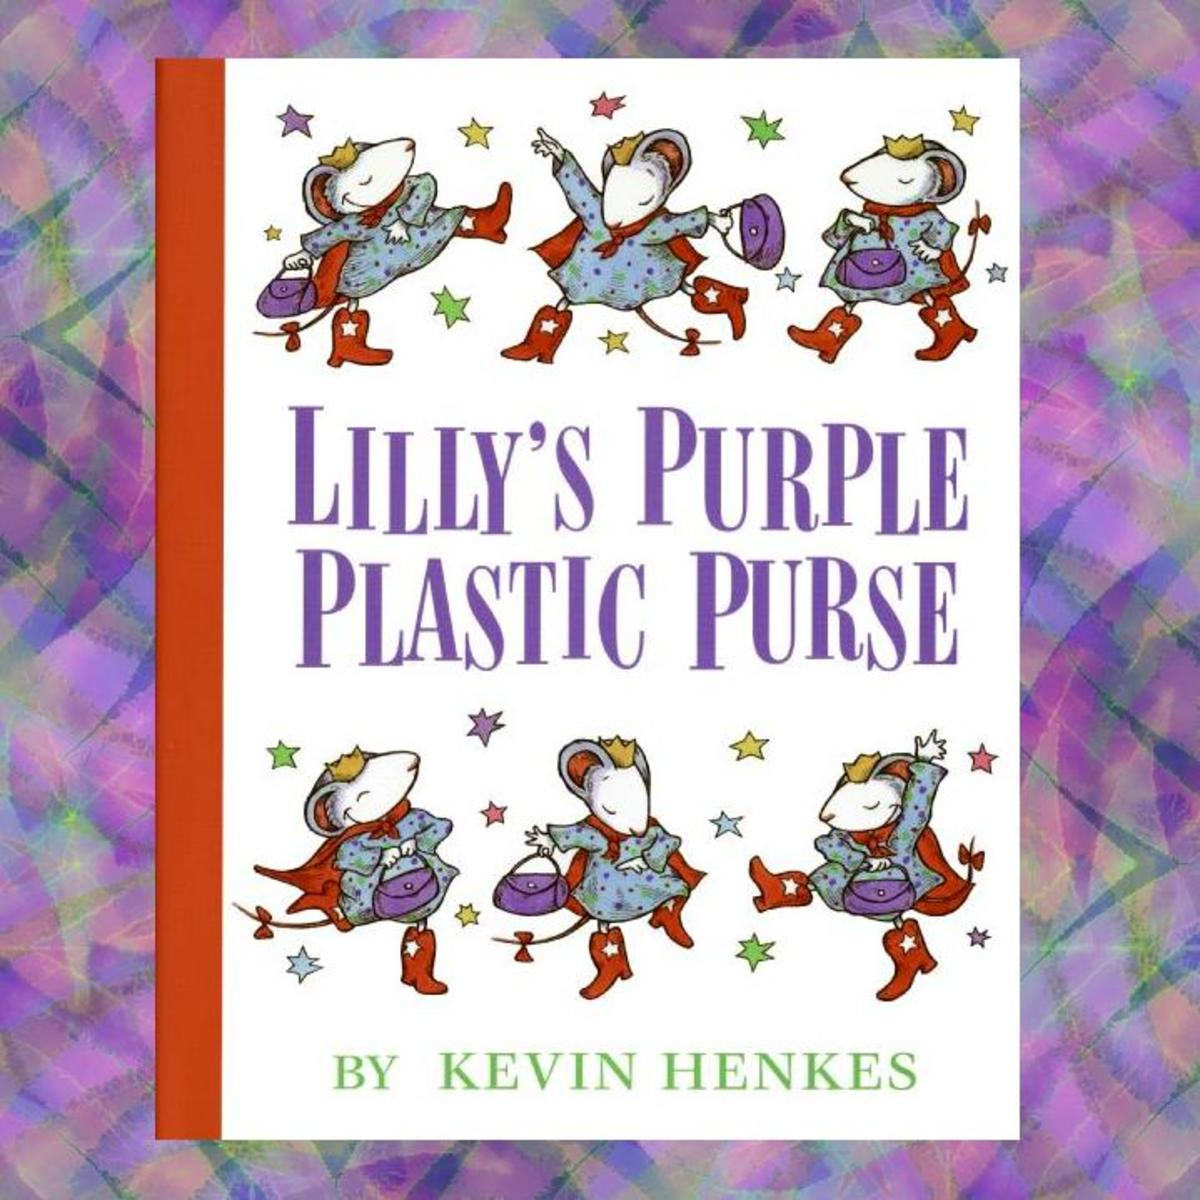 Lilly's Purple Plastic Purse book cover.